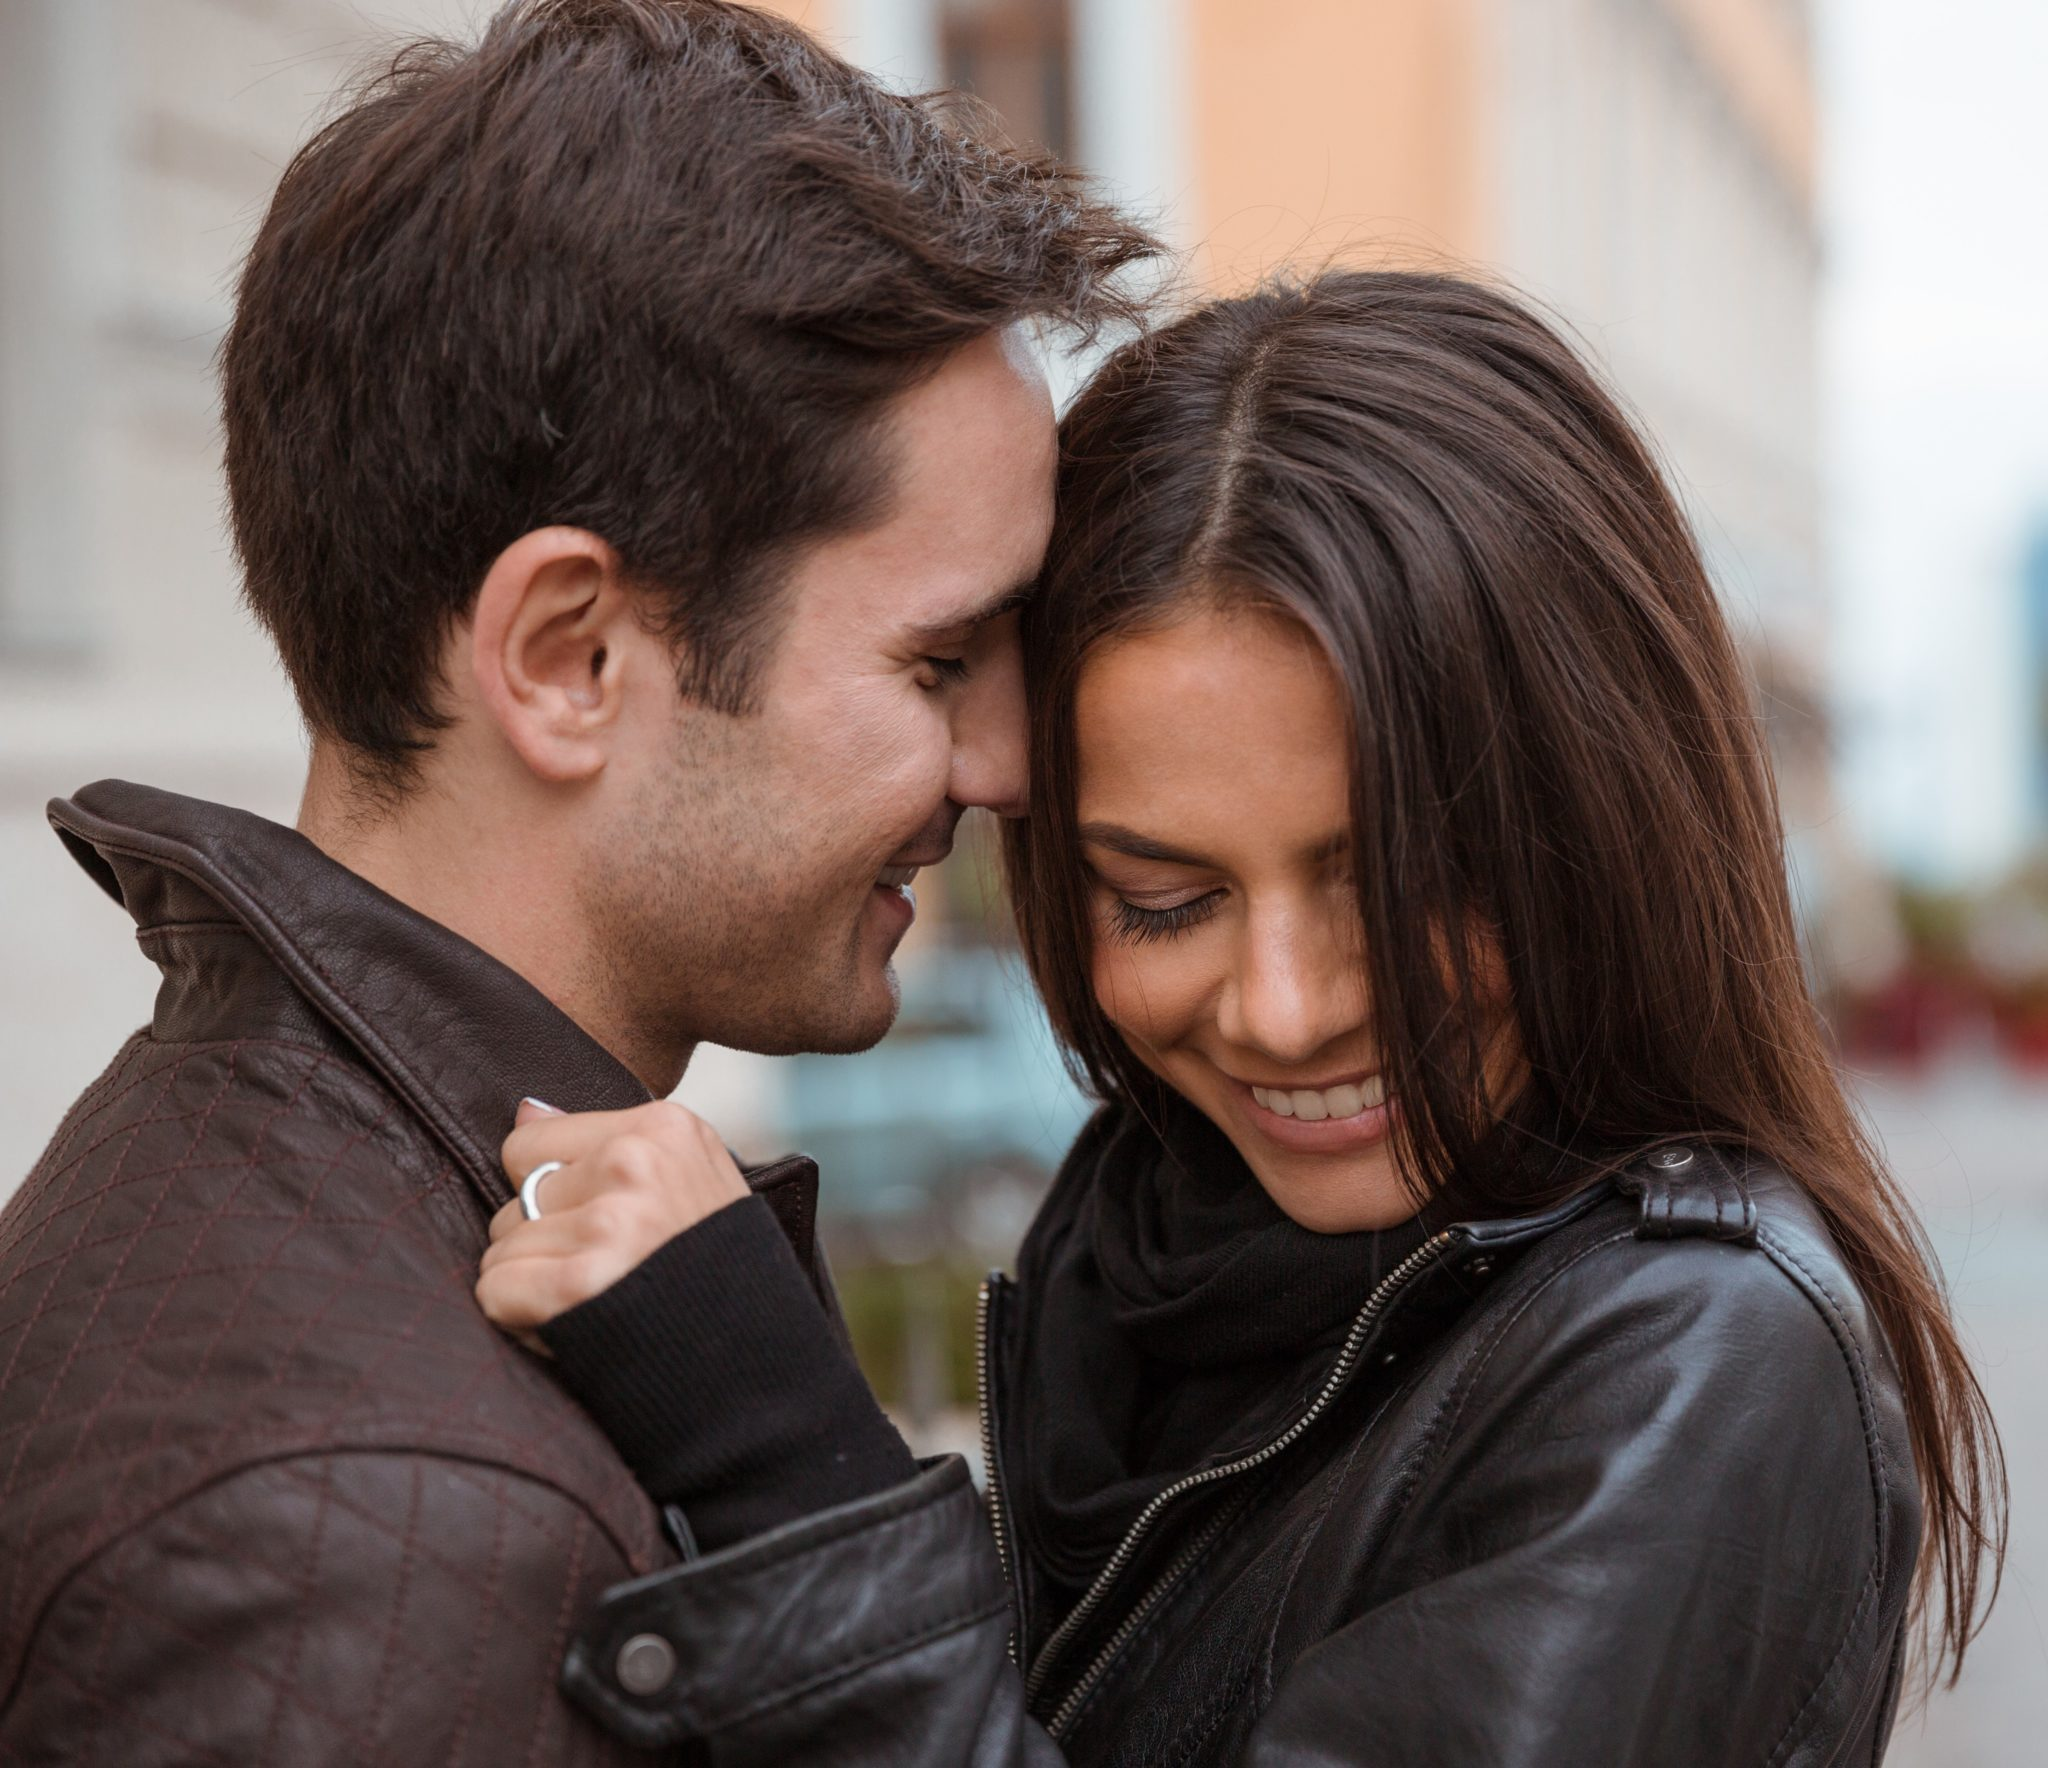 I like dating married man psychology